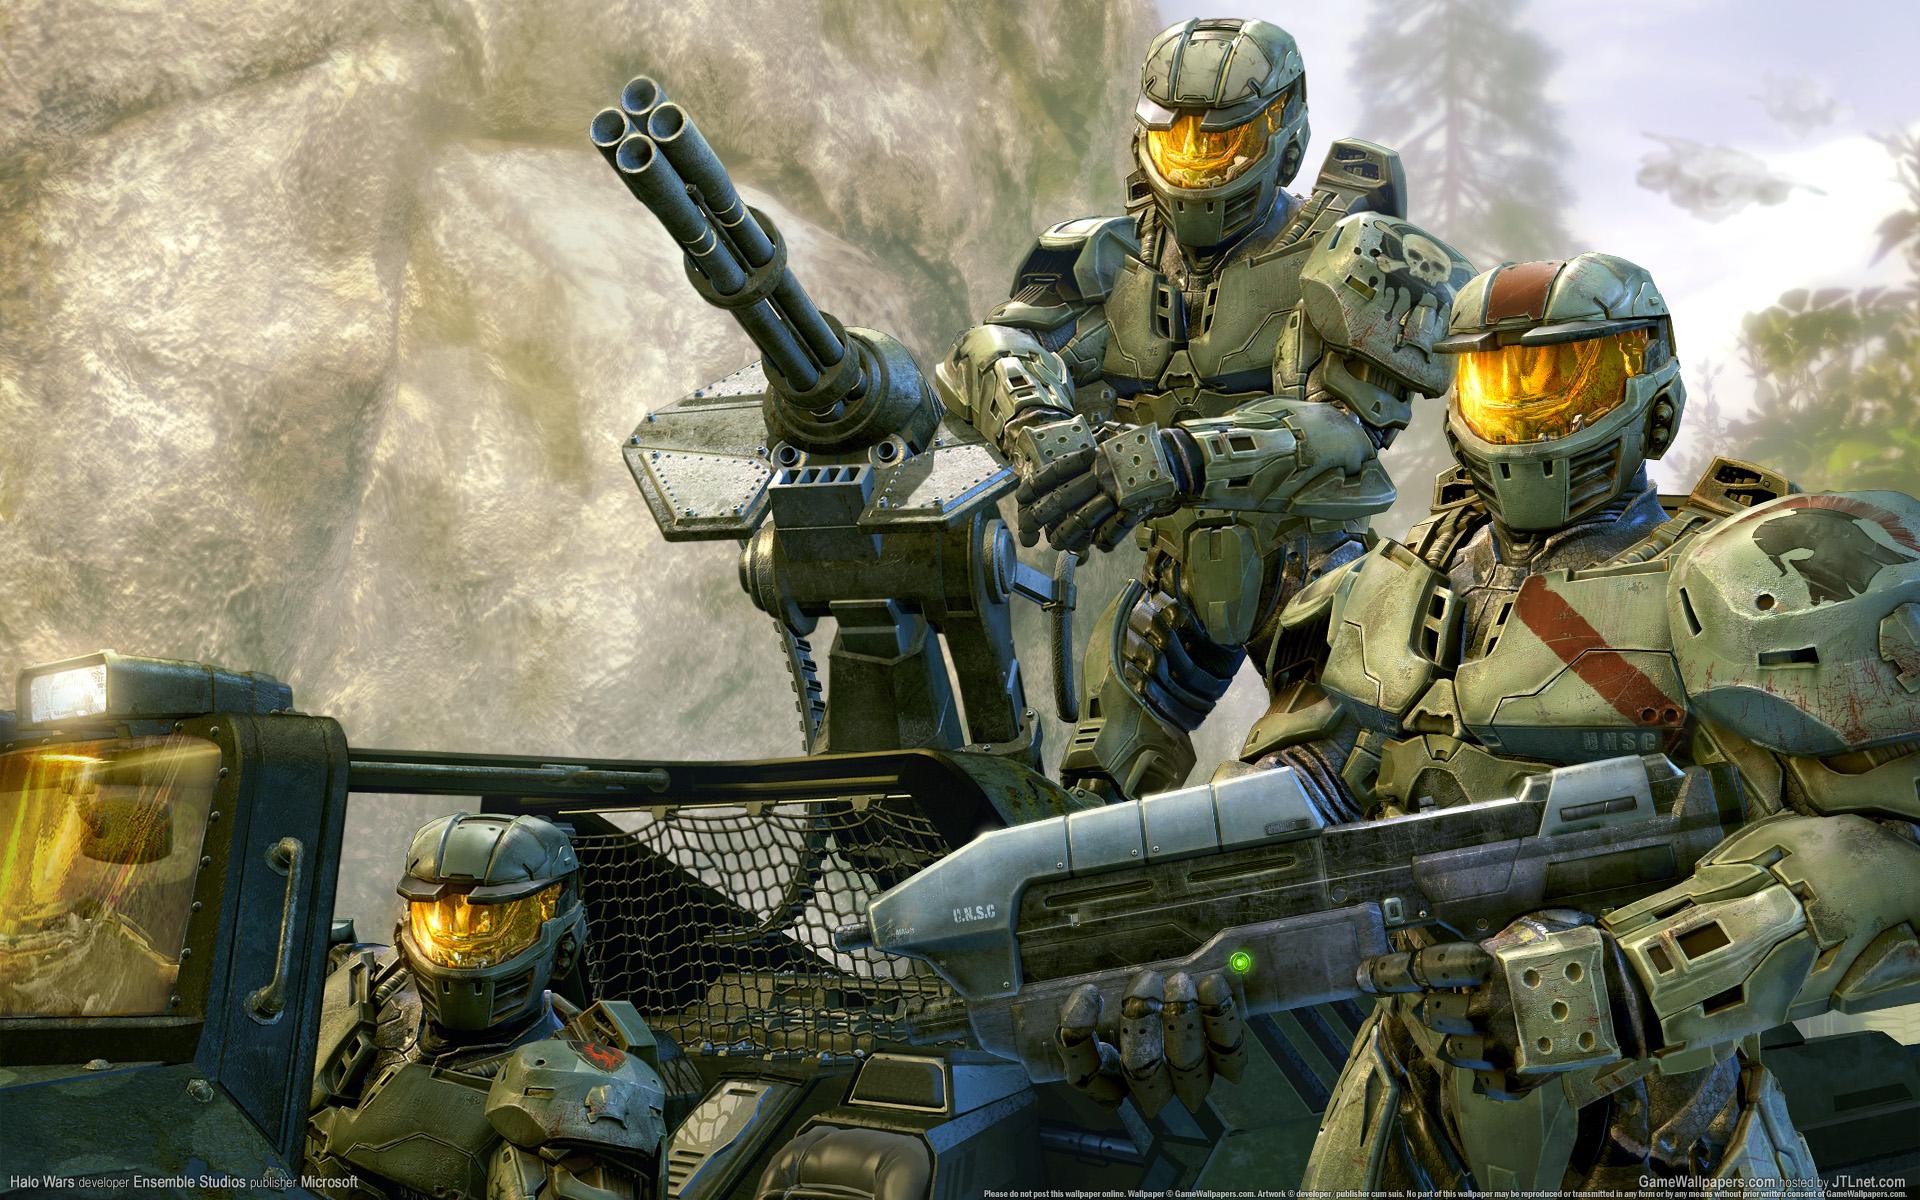 Halo Wars Wallpaper HD - WallpaperSafari